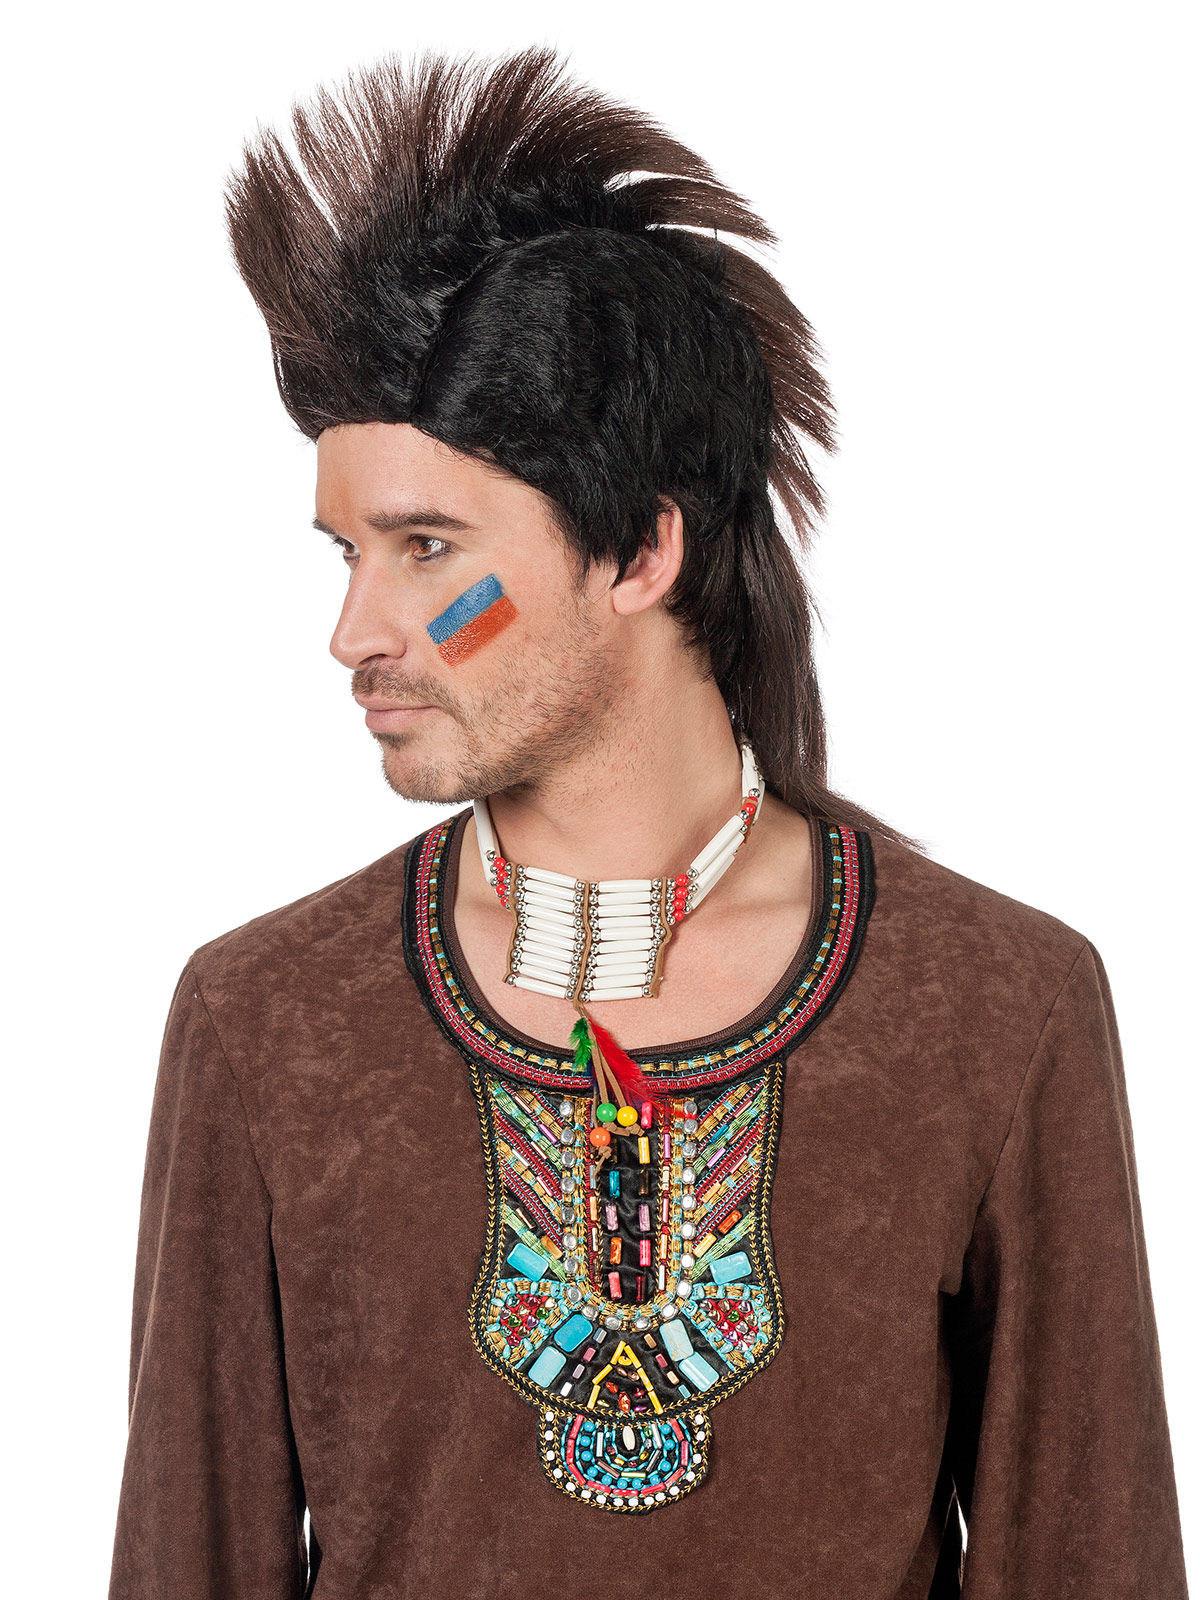 indianer per cke mohawk schwarz braun g nstige faschings accessoires zubeh r bei karneval. Black Bedroom Furniture Sets. Home Design Ideas